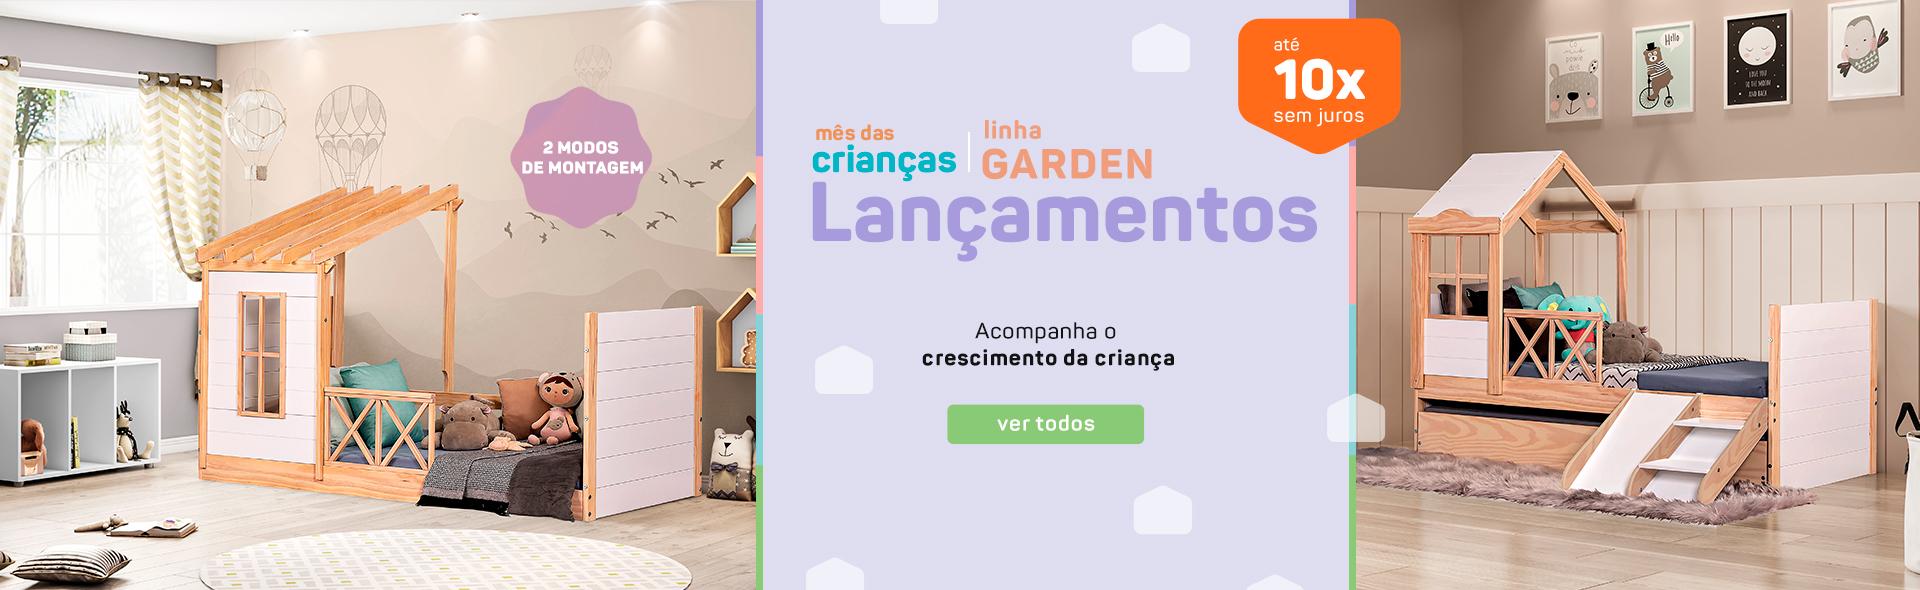 Lançamento Garden